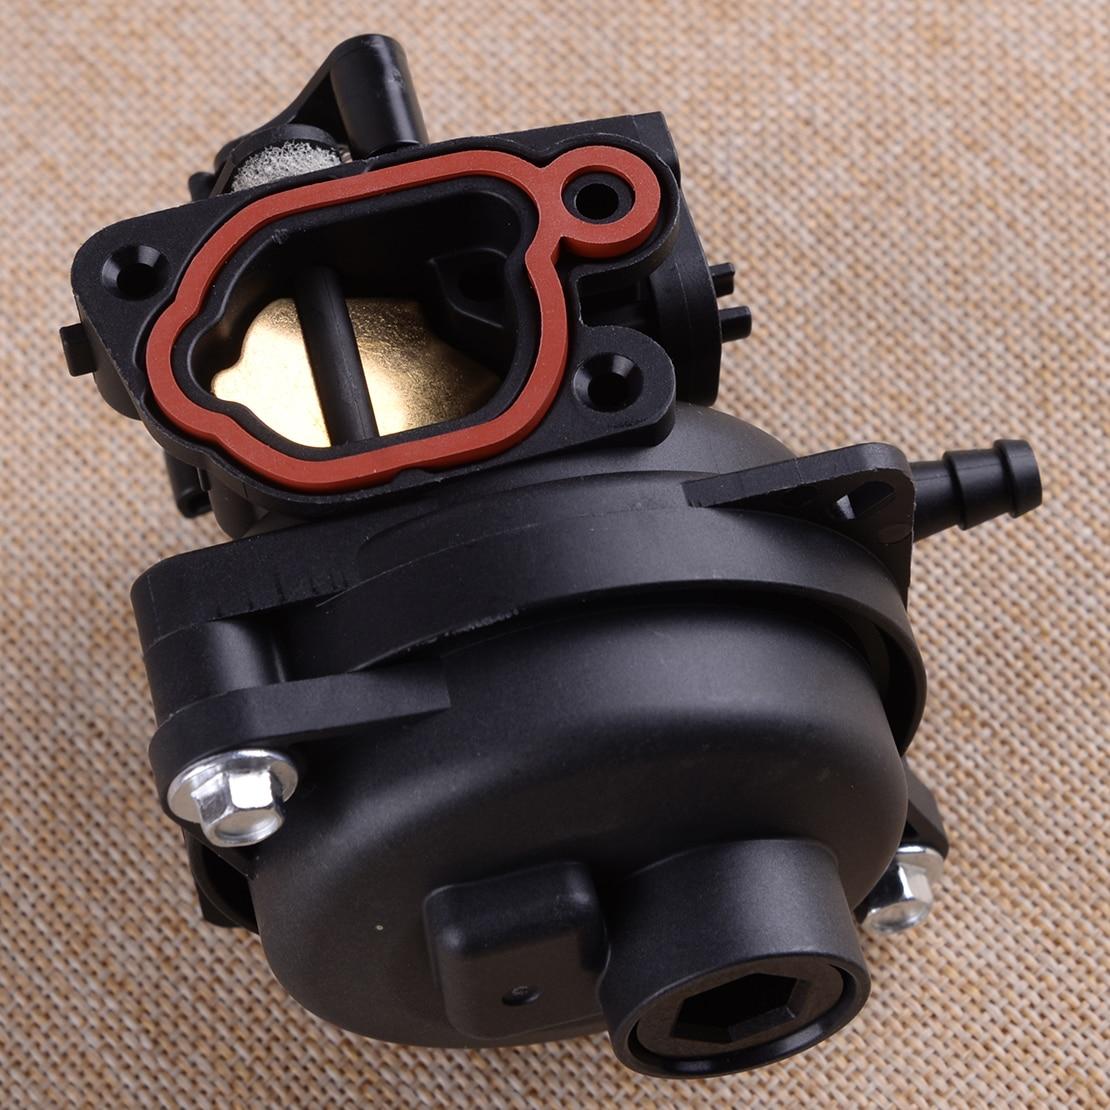 Carburetor Carb For Troy-Bilt TB200 TB110 Husqvarna LC 121P push lawnmower